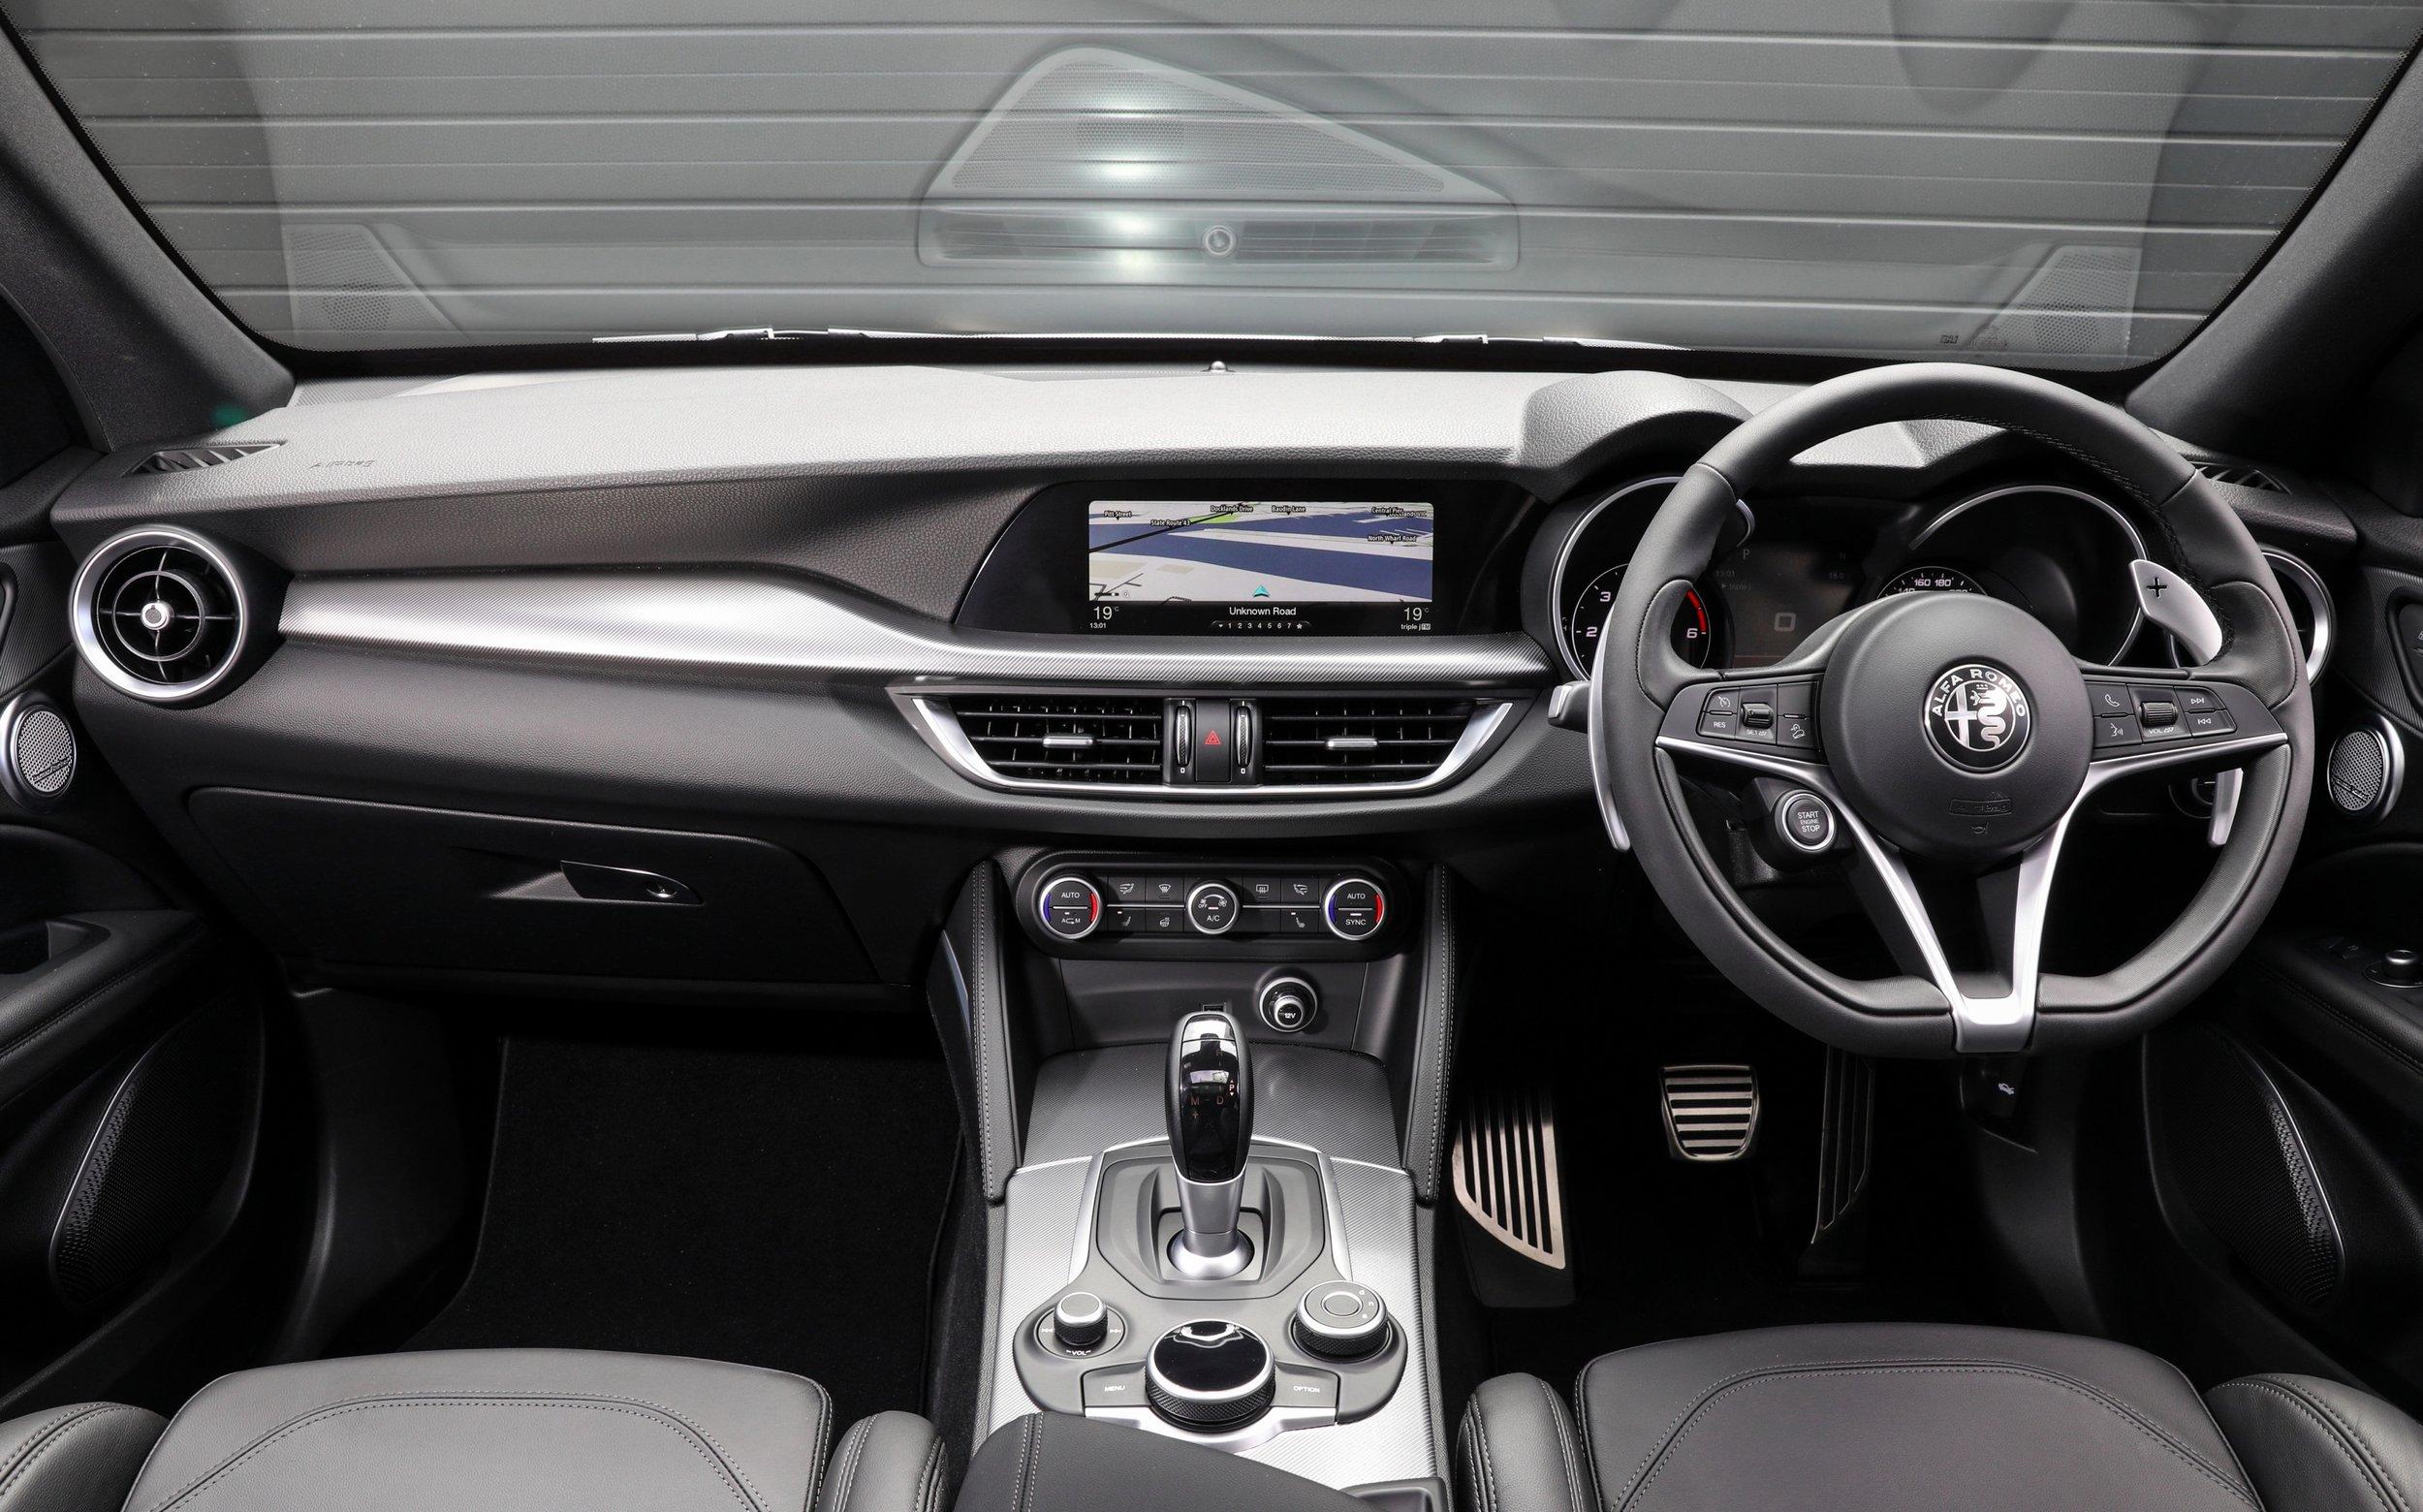 2018 Alfa Romeo Stelvio_Interior_0009.JPG